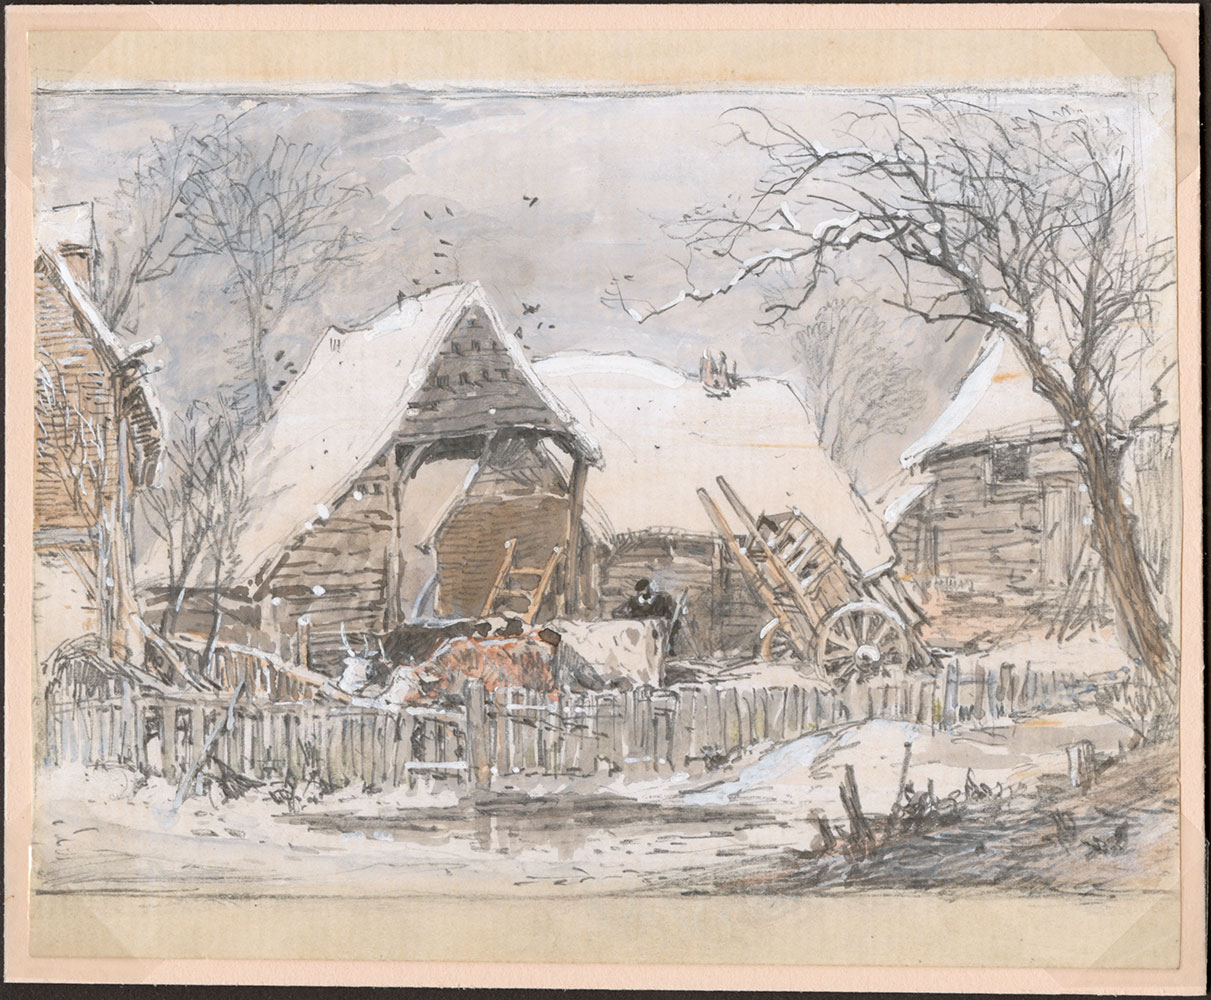 Myles Birket Foster. <i>Scenic landscape illustration.</i>